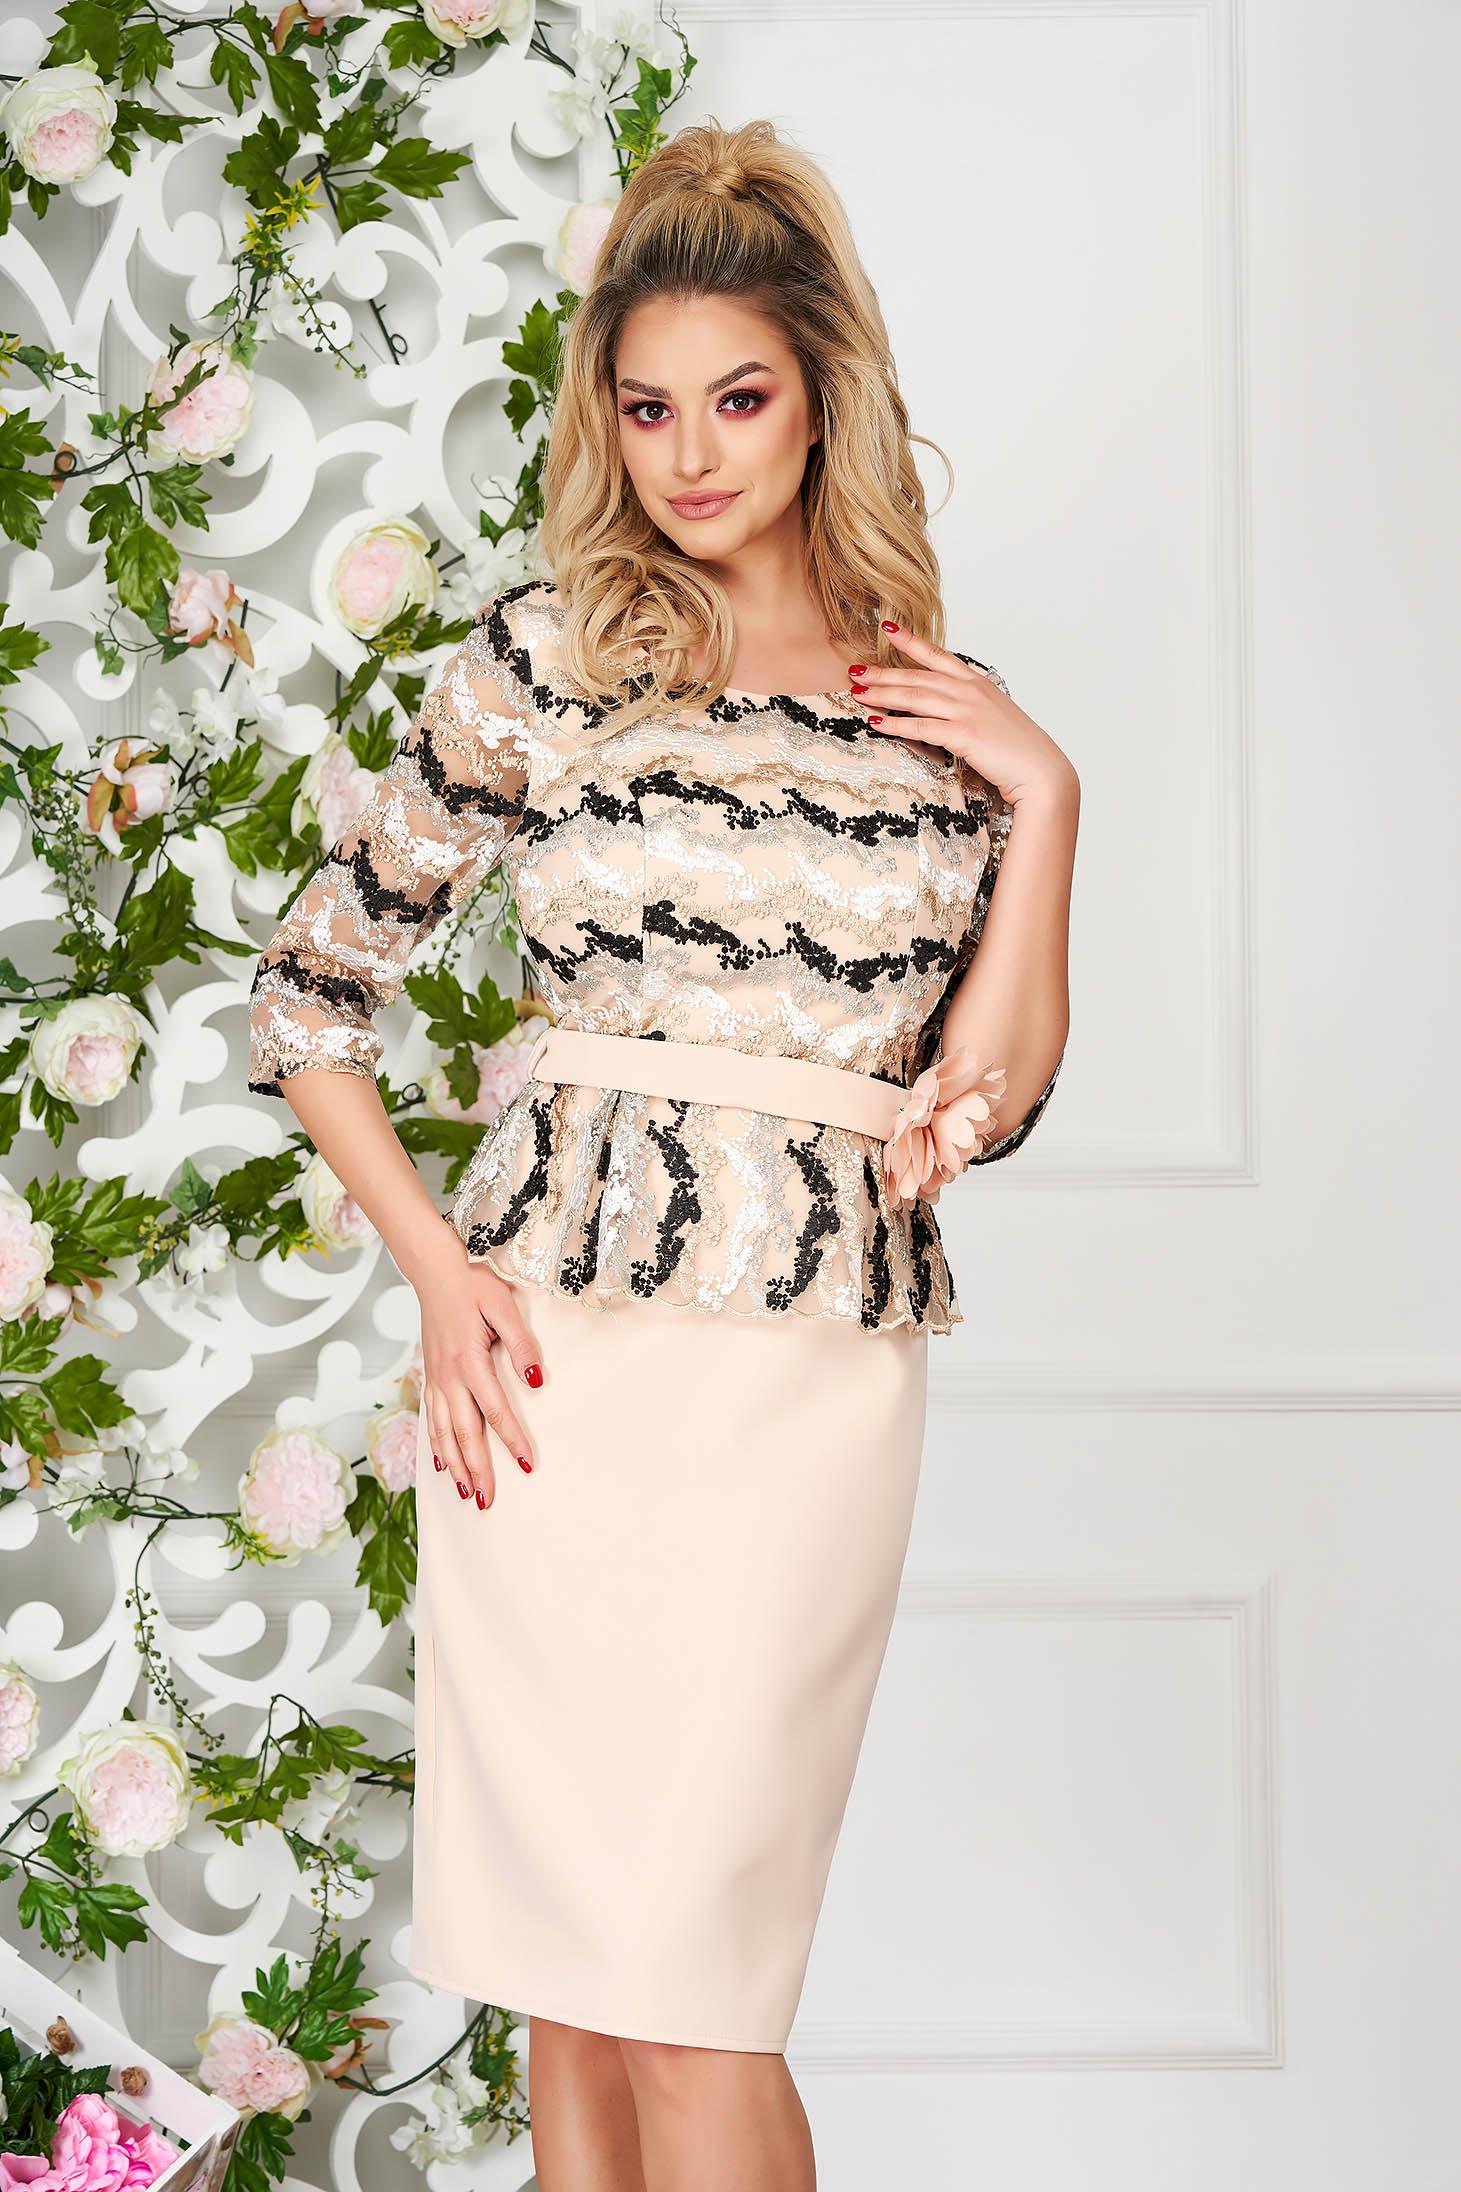 Cream dress occasional accessorized with belt pencil peplum cloth